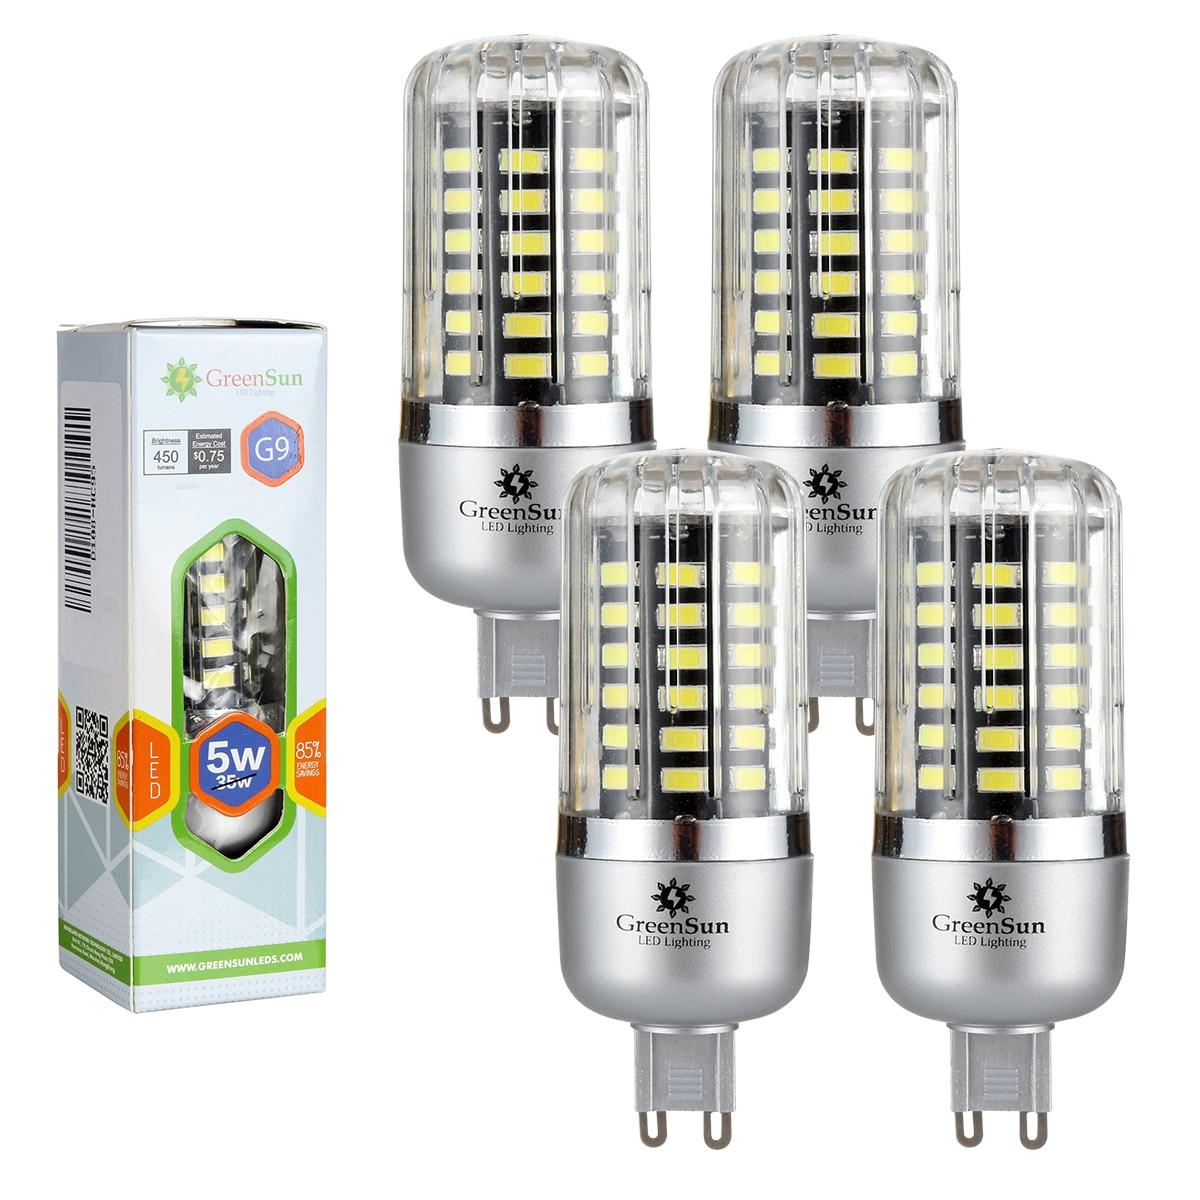 4/10 pcs 85-265V Full Watt Smart IC LED Corn Bulb 5736 SMD Lamp G9 3W 5W 7WLED No Flicker Light Bulbs 2pcs real full watt 3w 5w 7w 8w 12w 15w e27 e14 led corn bulb 85v 265v smd 5736 led lamp spot light 28 40 72 108 132 156 leds